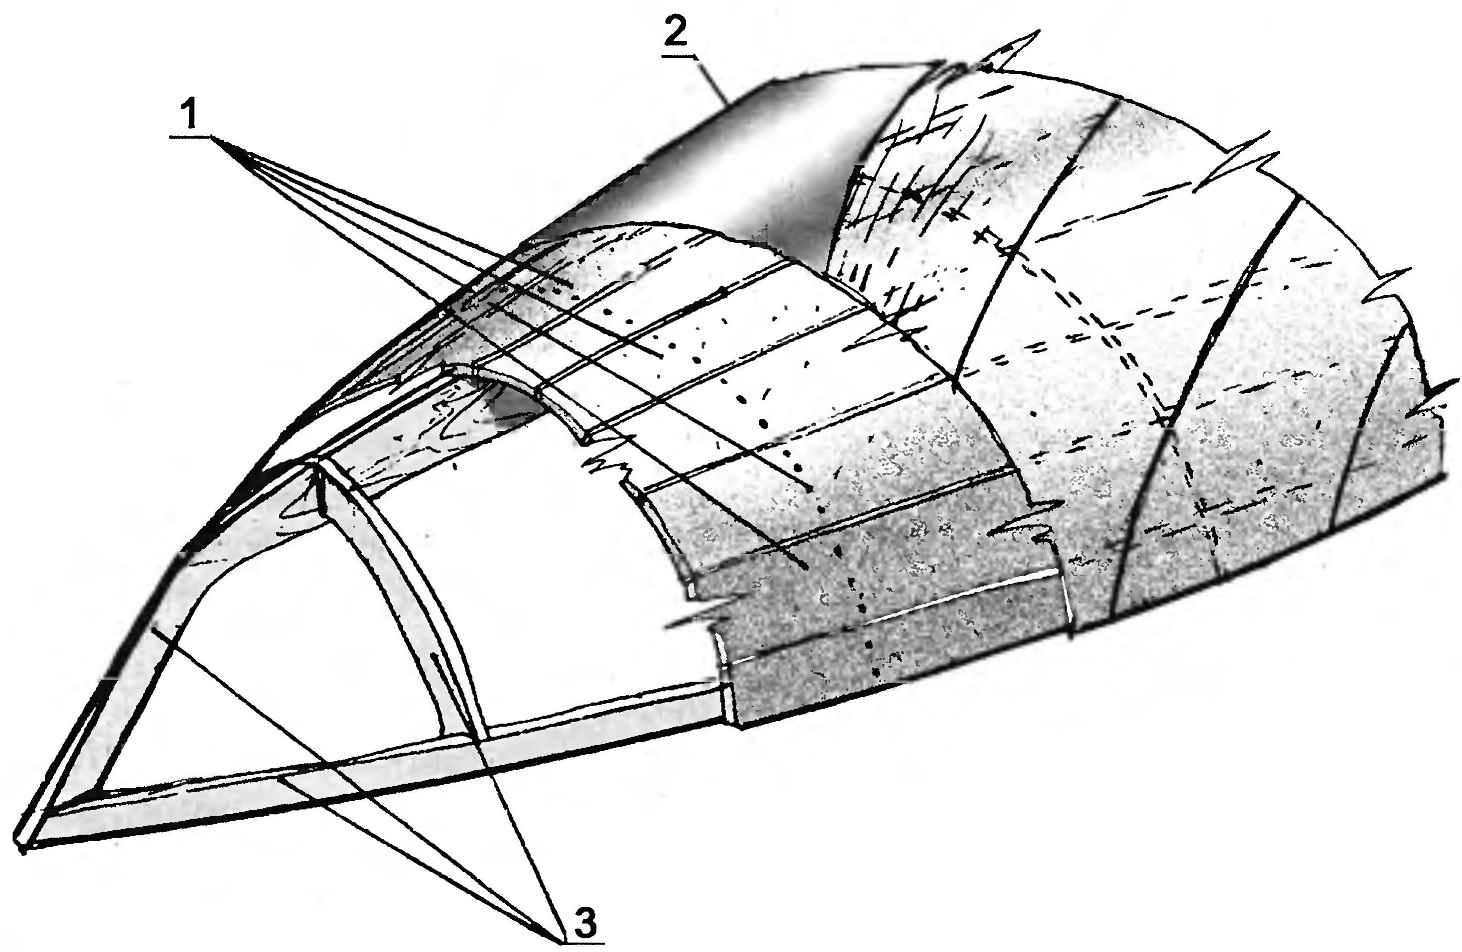 Рис. 8. Композитный корпус с обшивкой типа «сандвич»